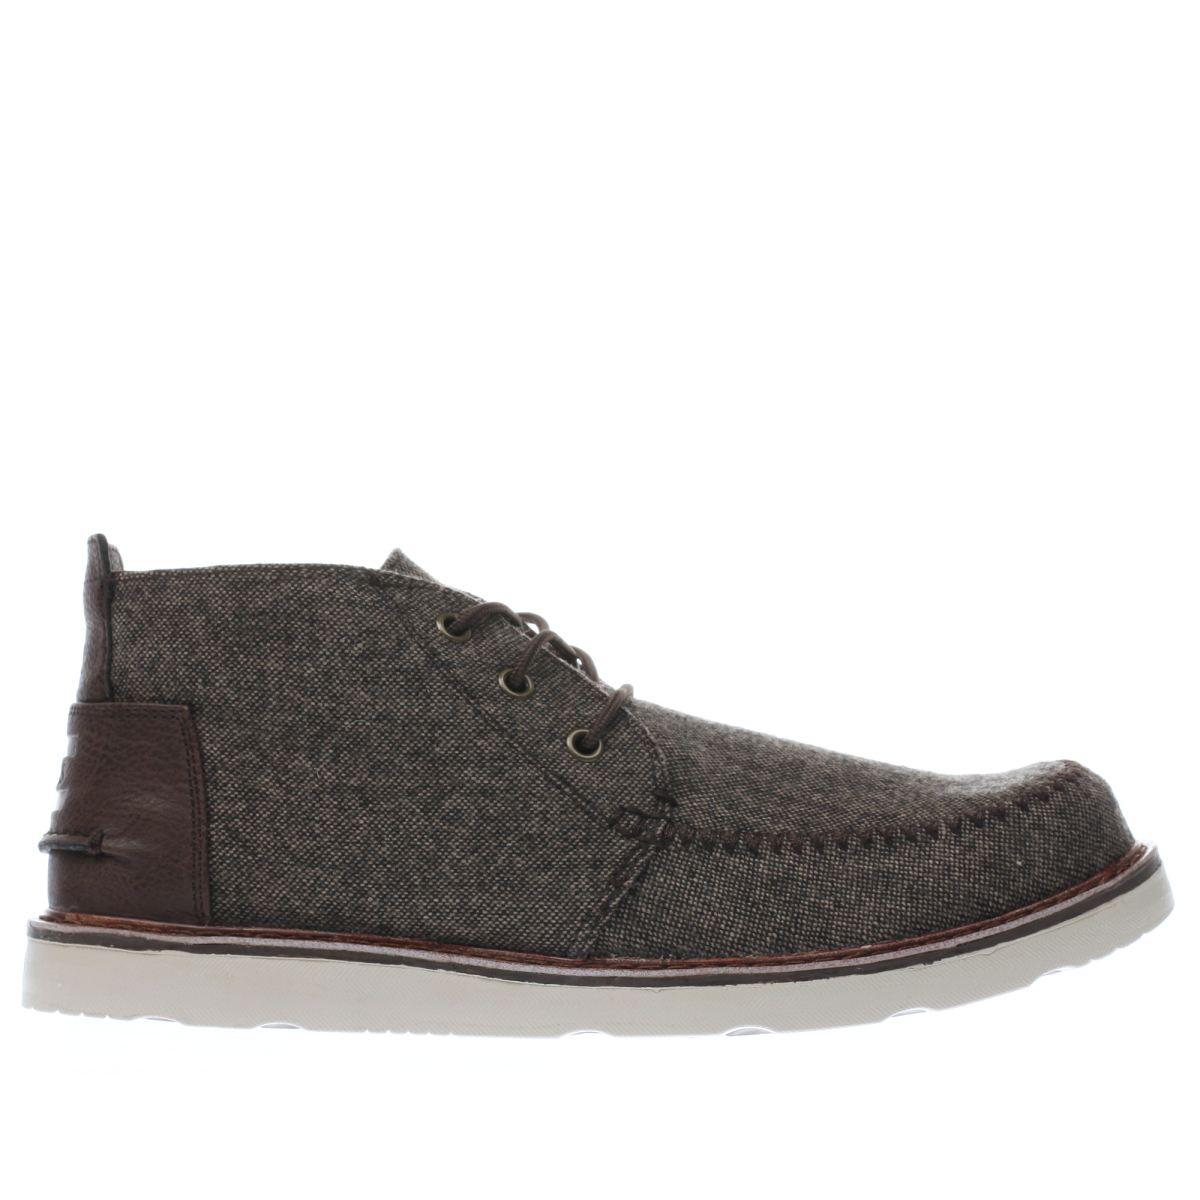 toms dark brown chukka boot boots